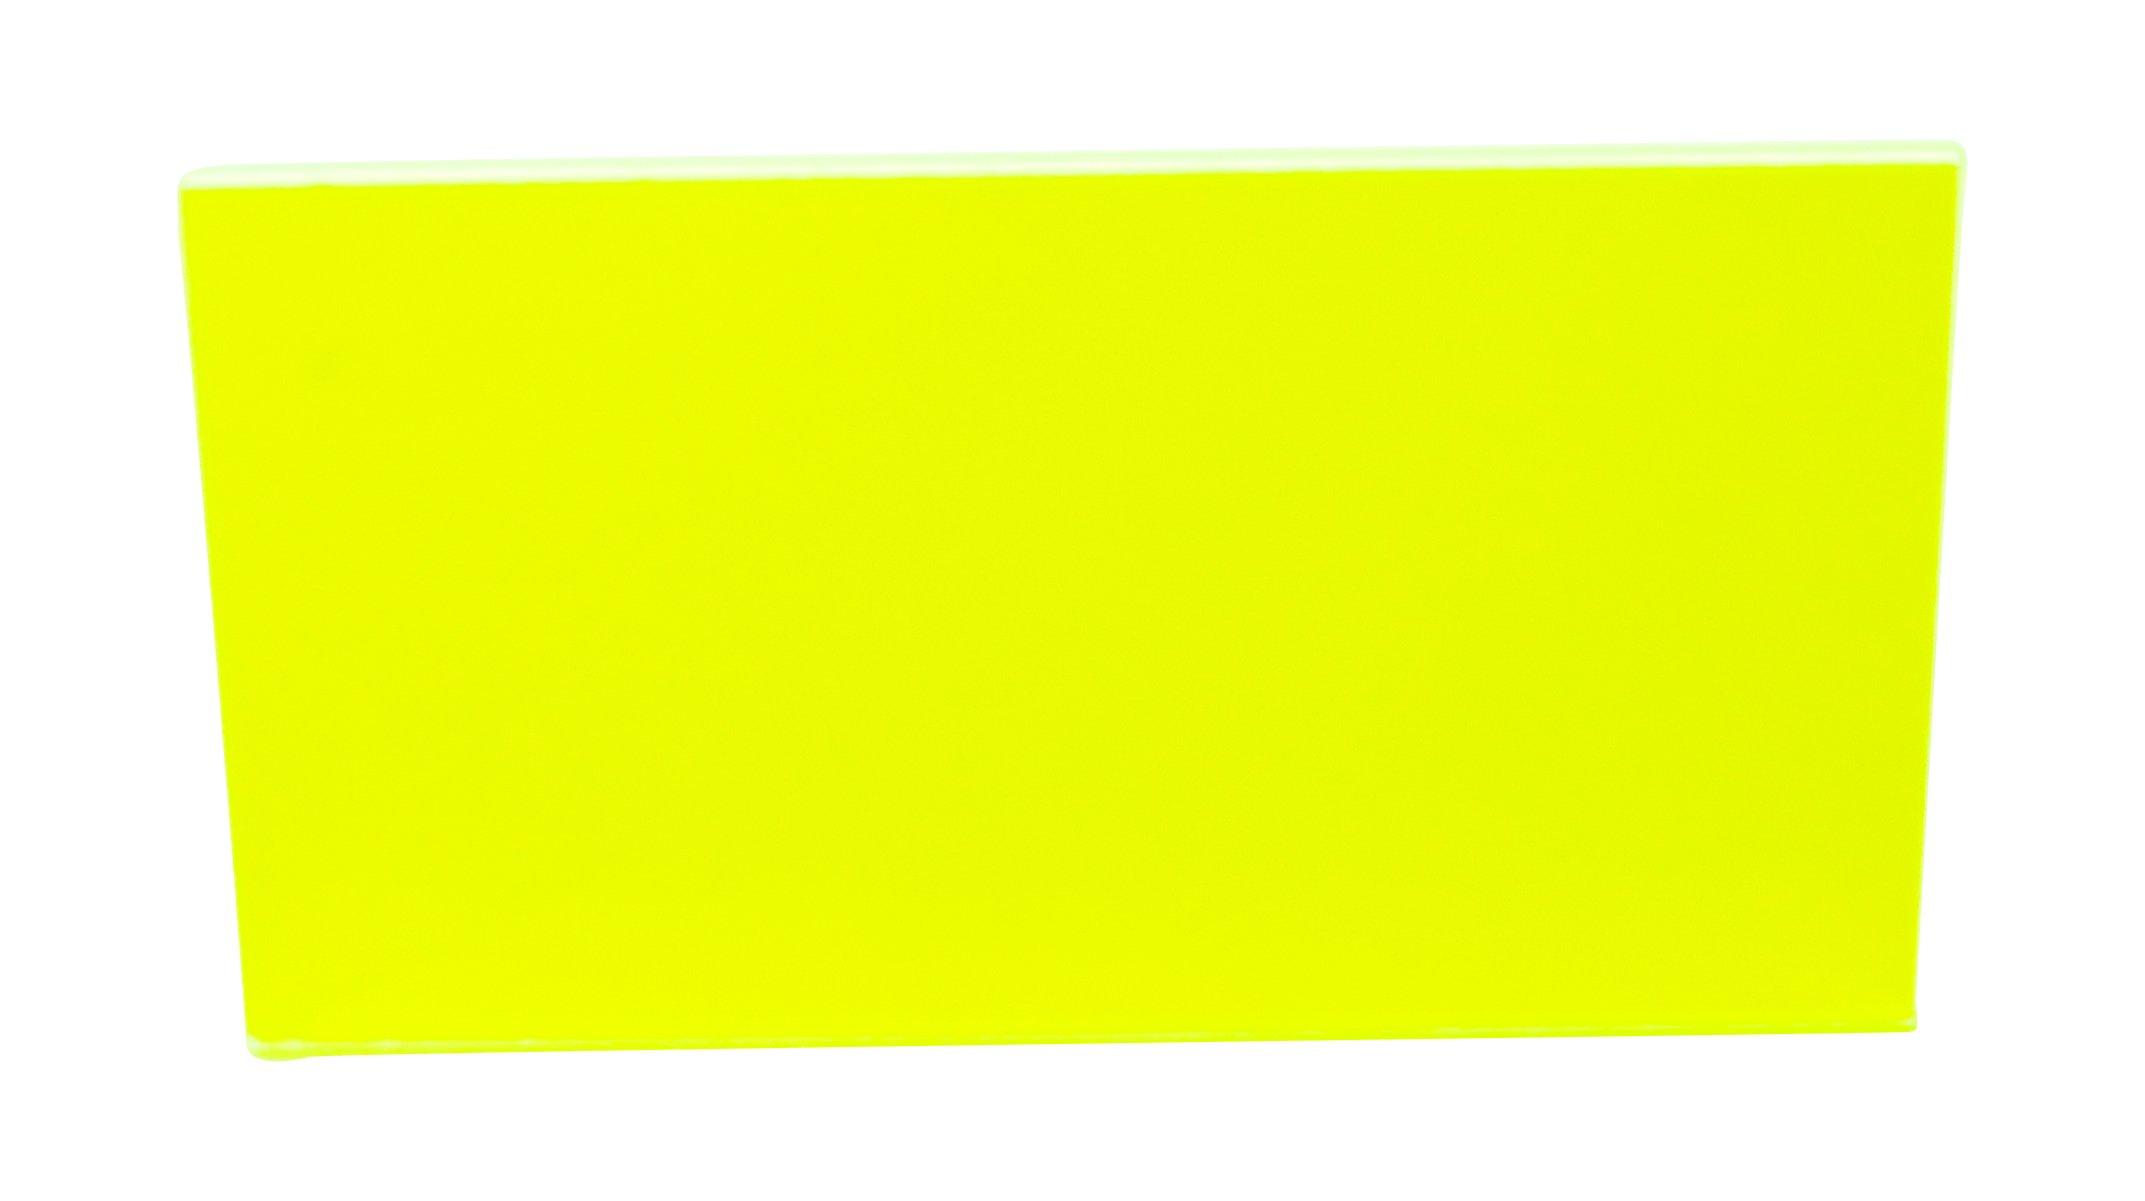 Falken Design Corporation FLUOR-GN9093-1-8/1224 Plastic Acrylic Plexiglas Lucite Acrylic Fluorescent Green Sheet, Transparent 92%, 12'' x 24'', 1/8'' Thick